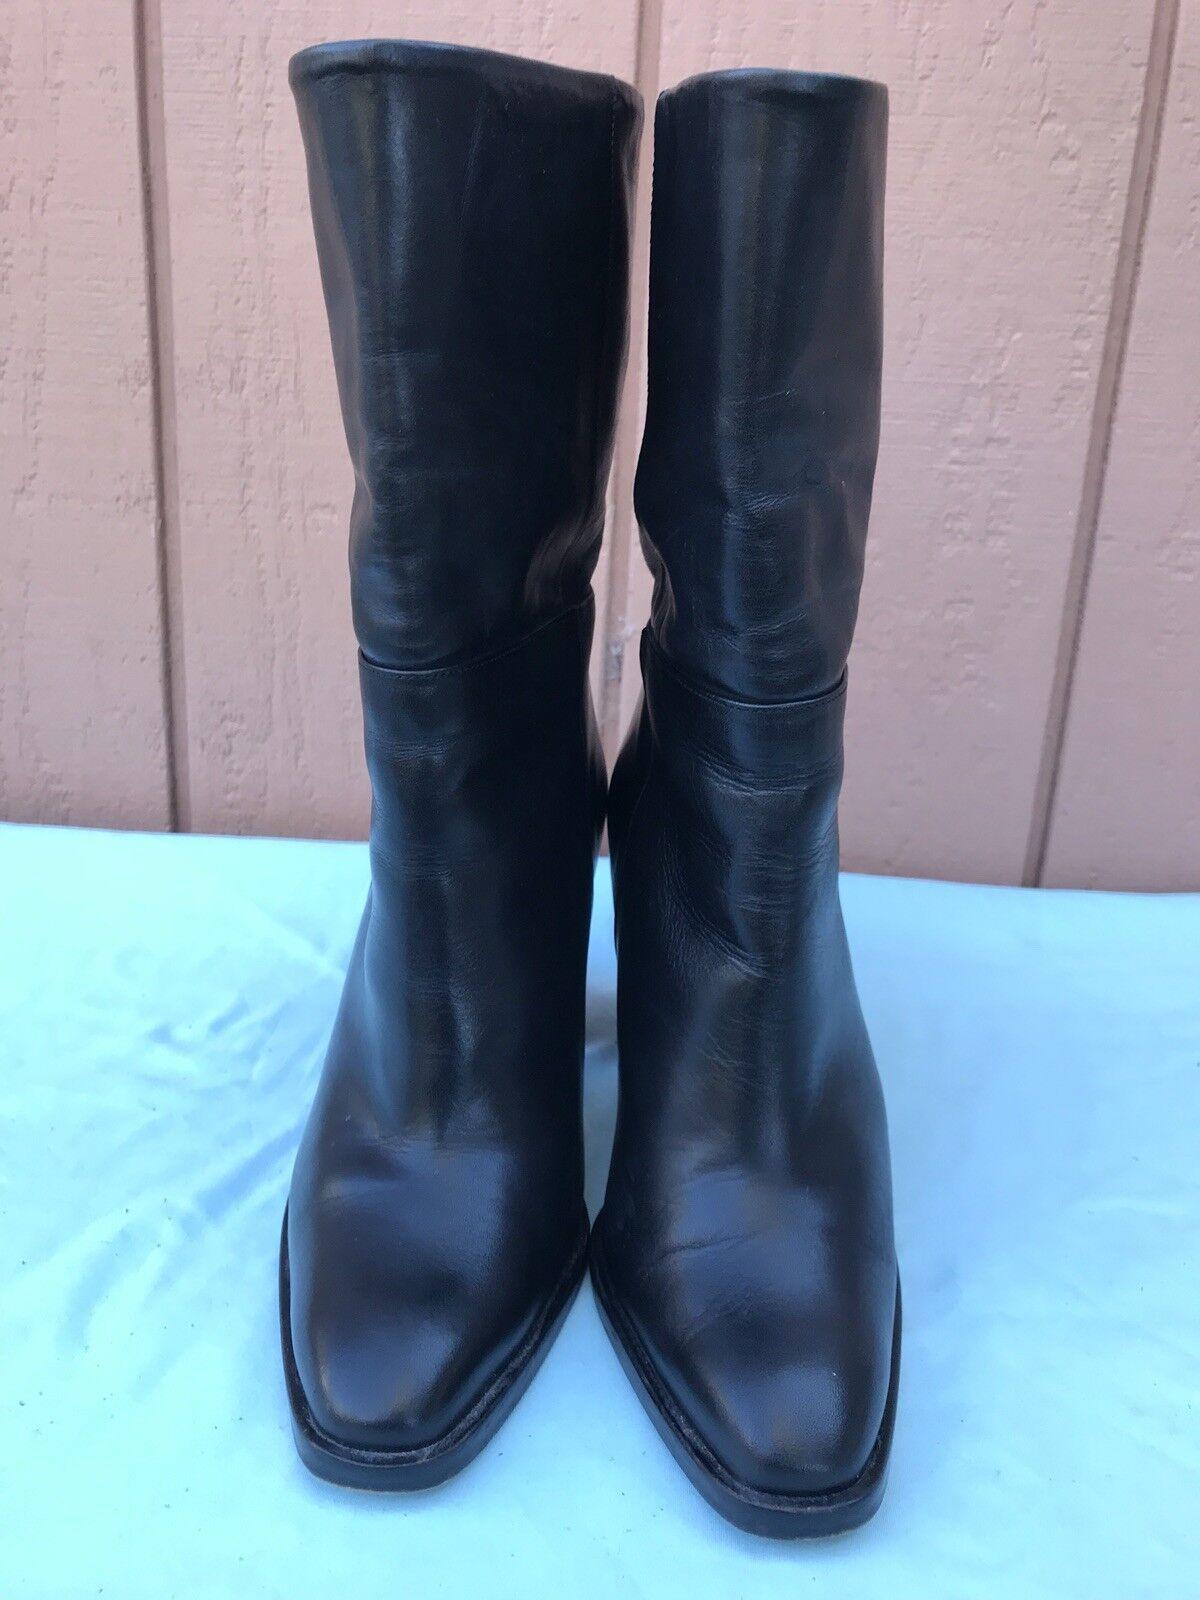 EUC  Massimo Dutti 38 US 7.5 Black Black Black Leather High Heel Pull On Mid Calf Boots AX 84b215